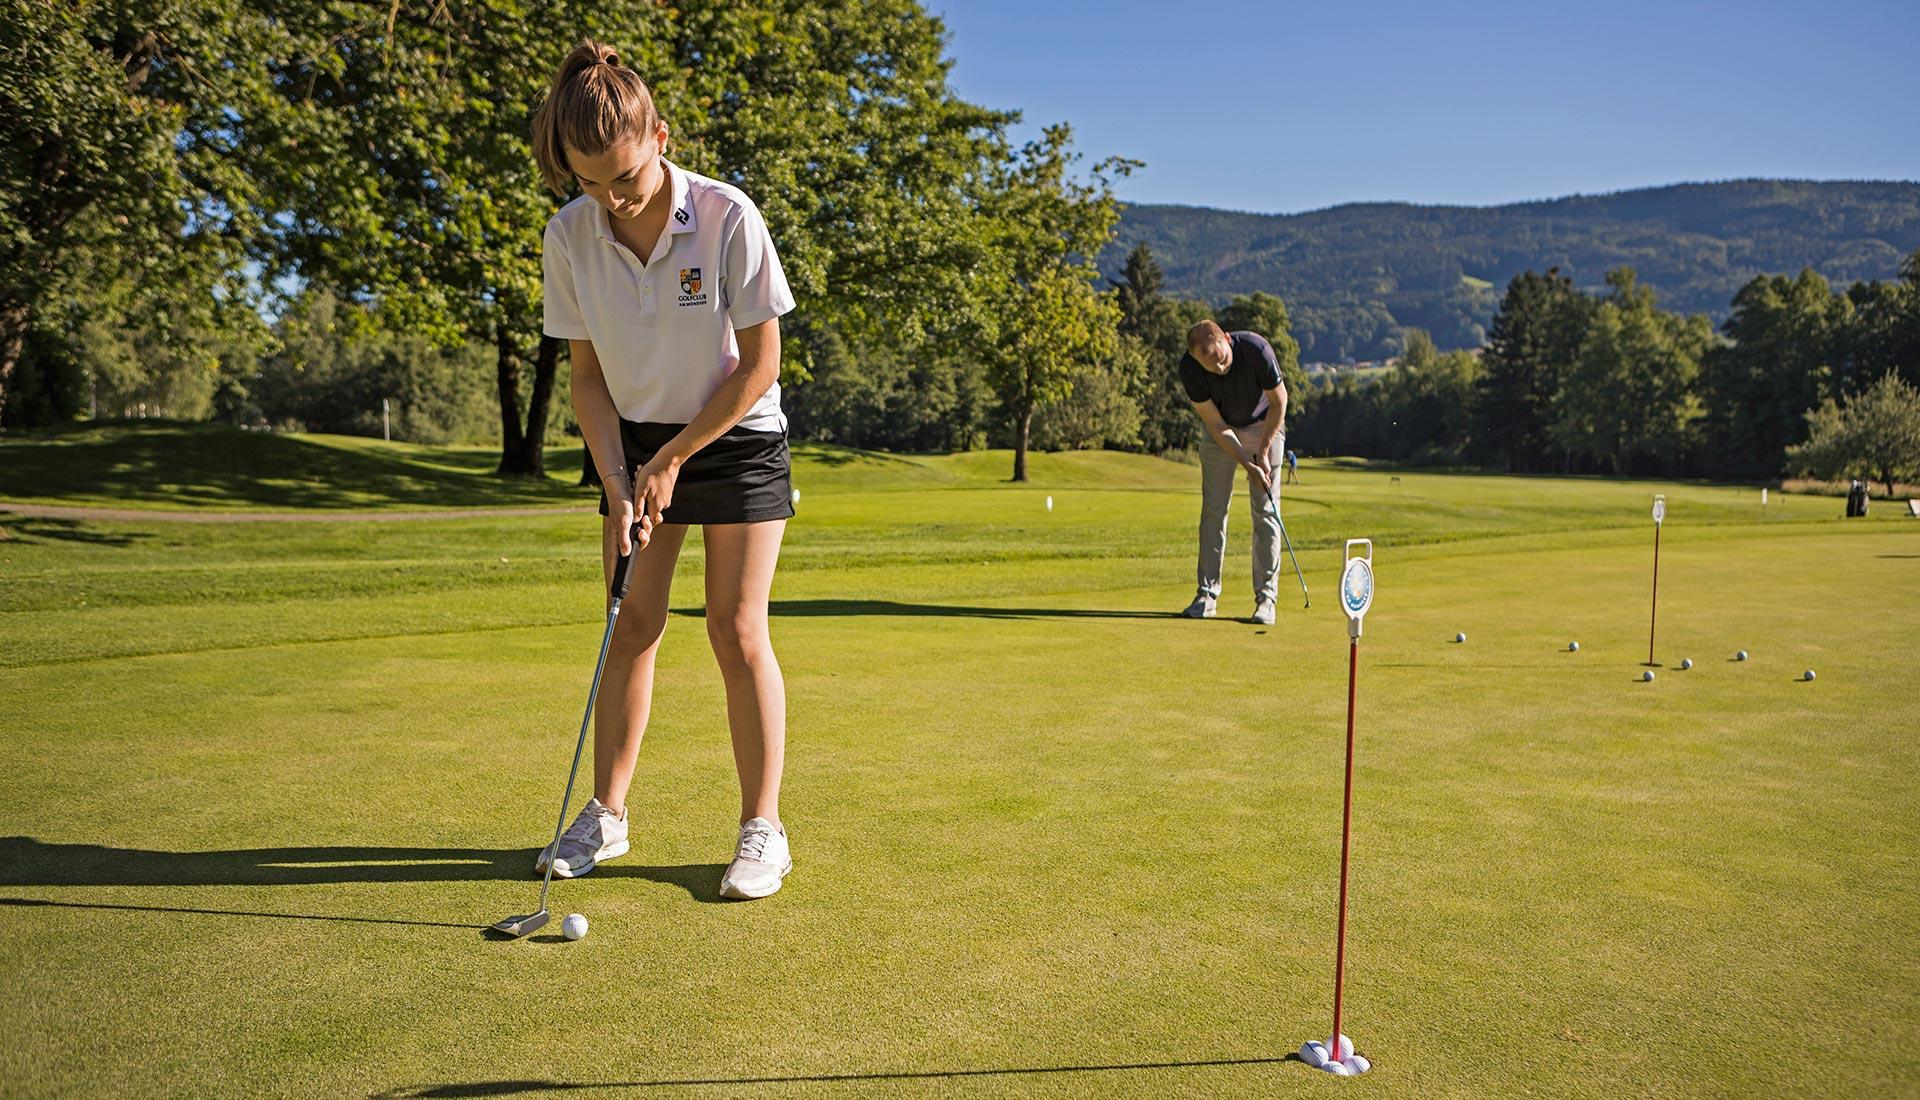 soft touch putter komperdell golf